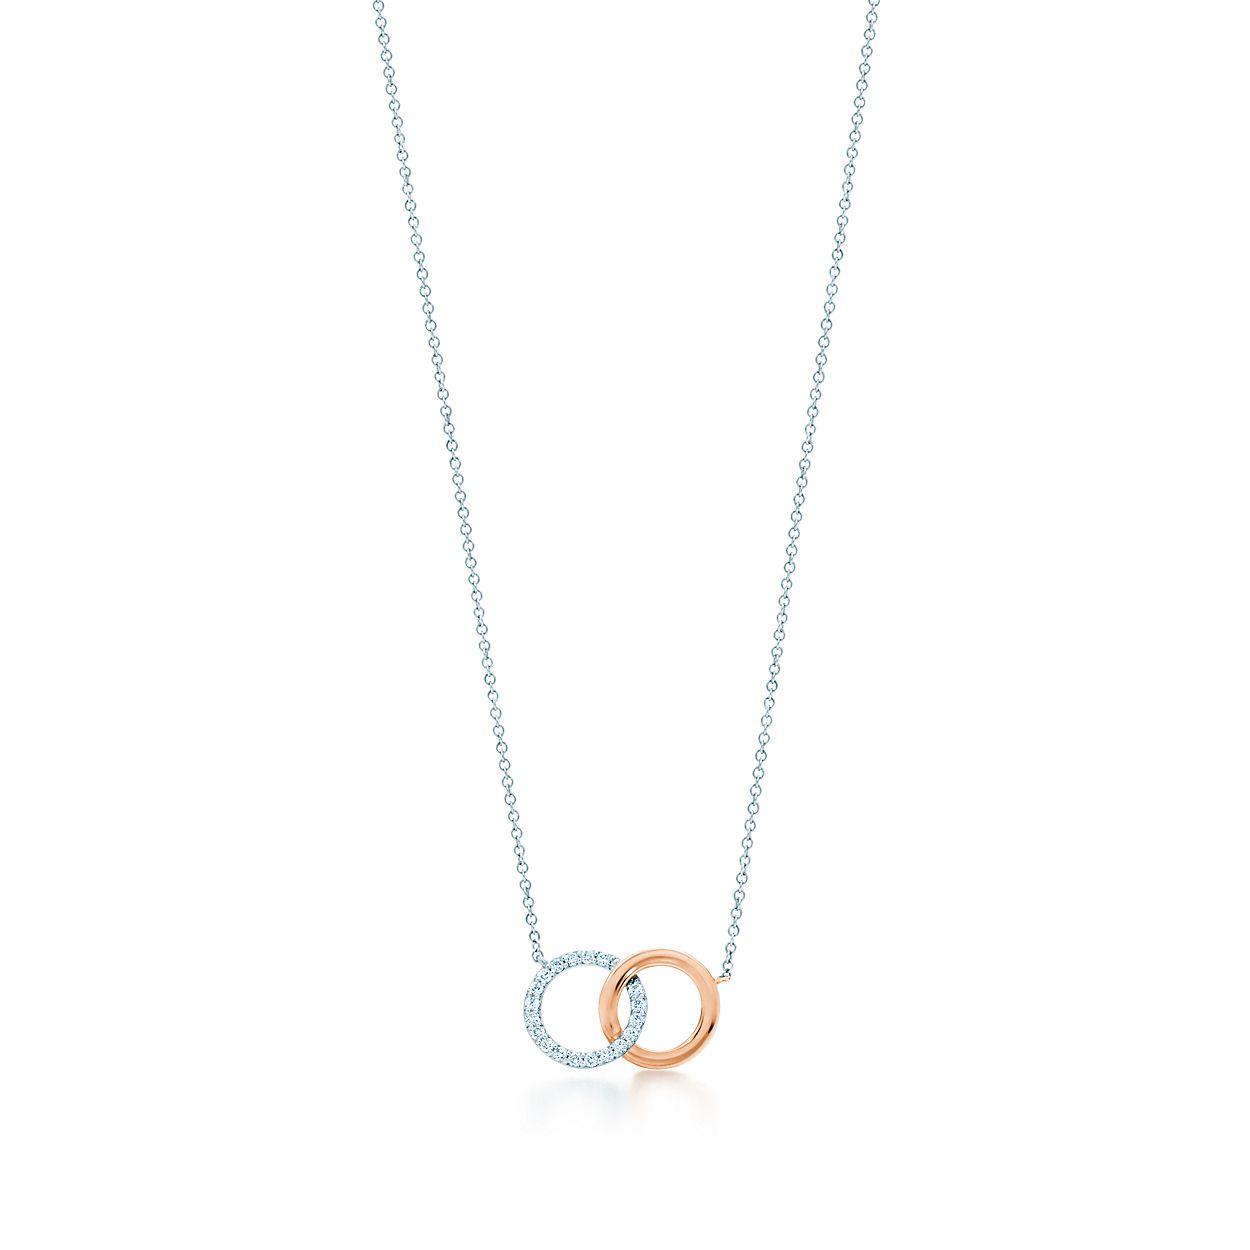 Tiffany 1837 interlocking circles pendant in white and rose gold tiffany 1837double interlocking circles pendant aloadofball Gallery